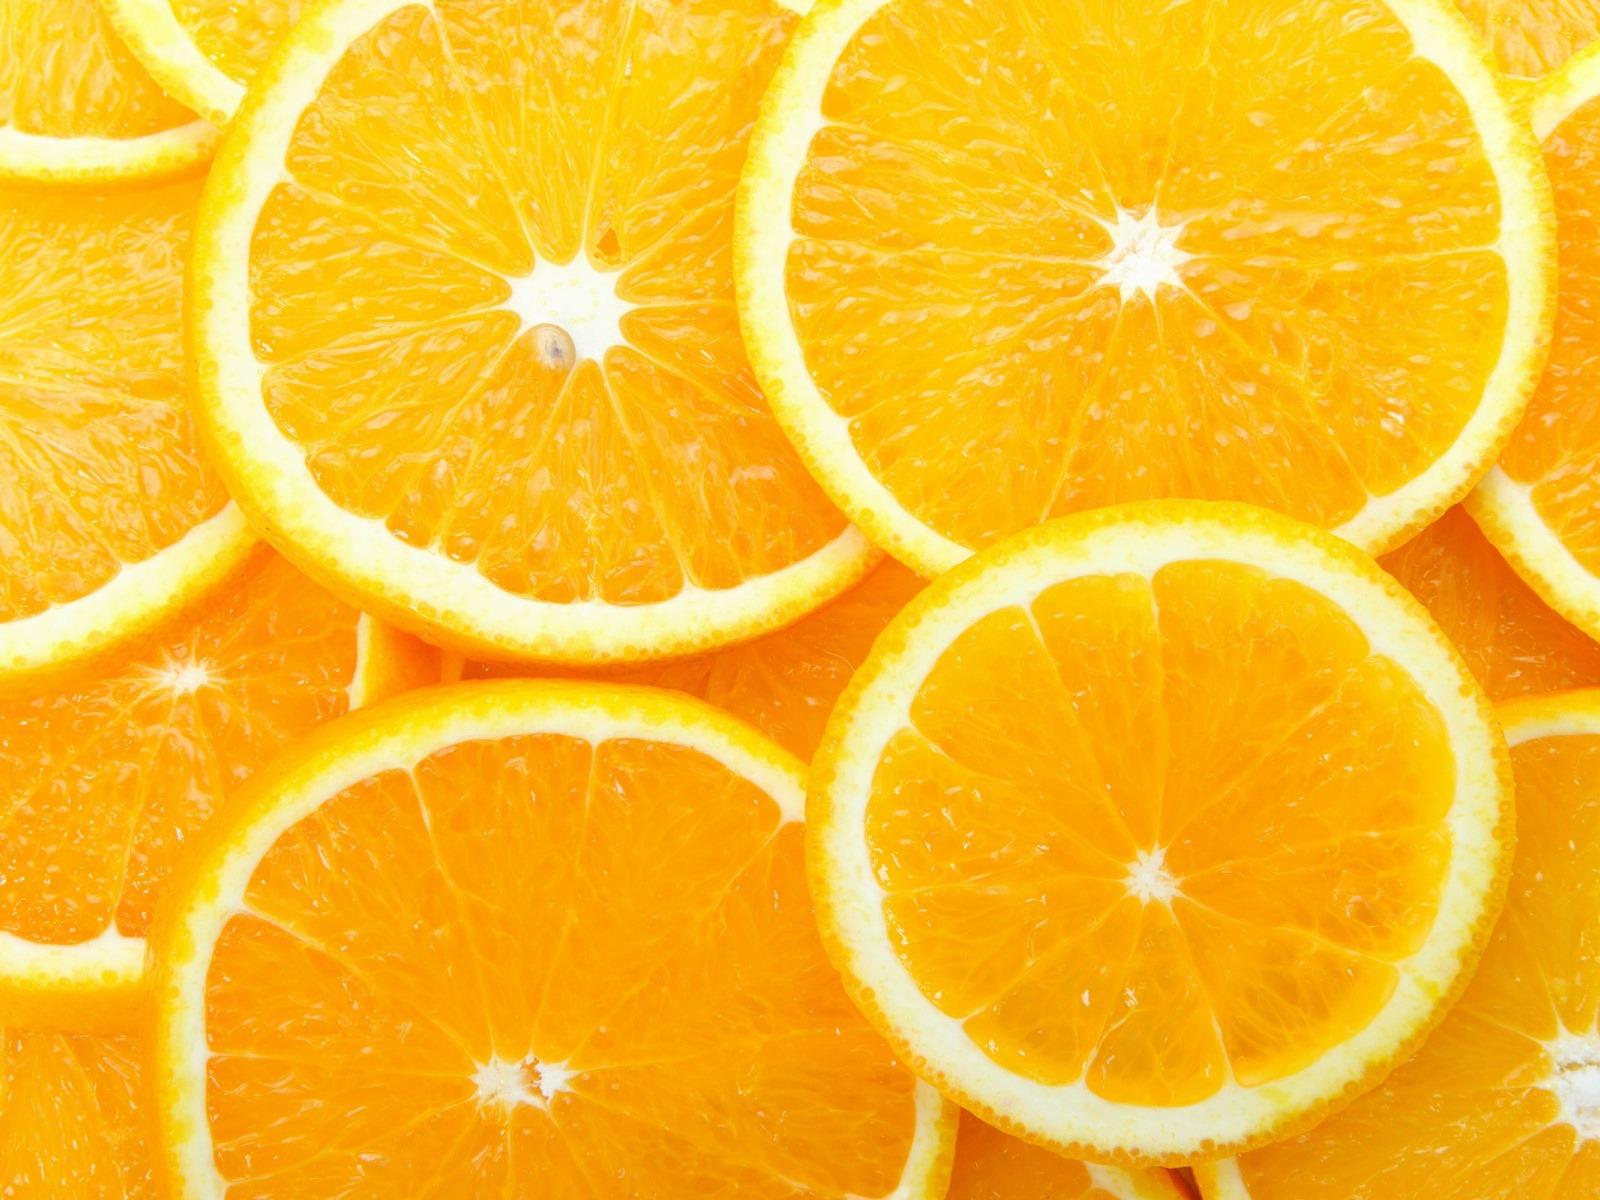 desktop orange wallpapers orange wallpaper orange background hd 7jpg 1600x1200